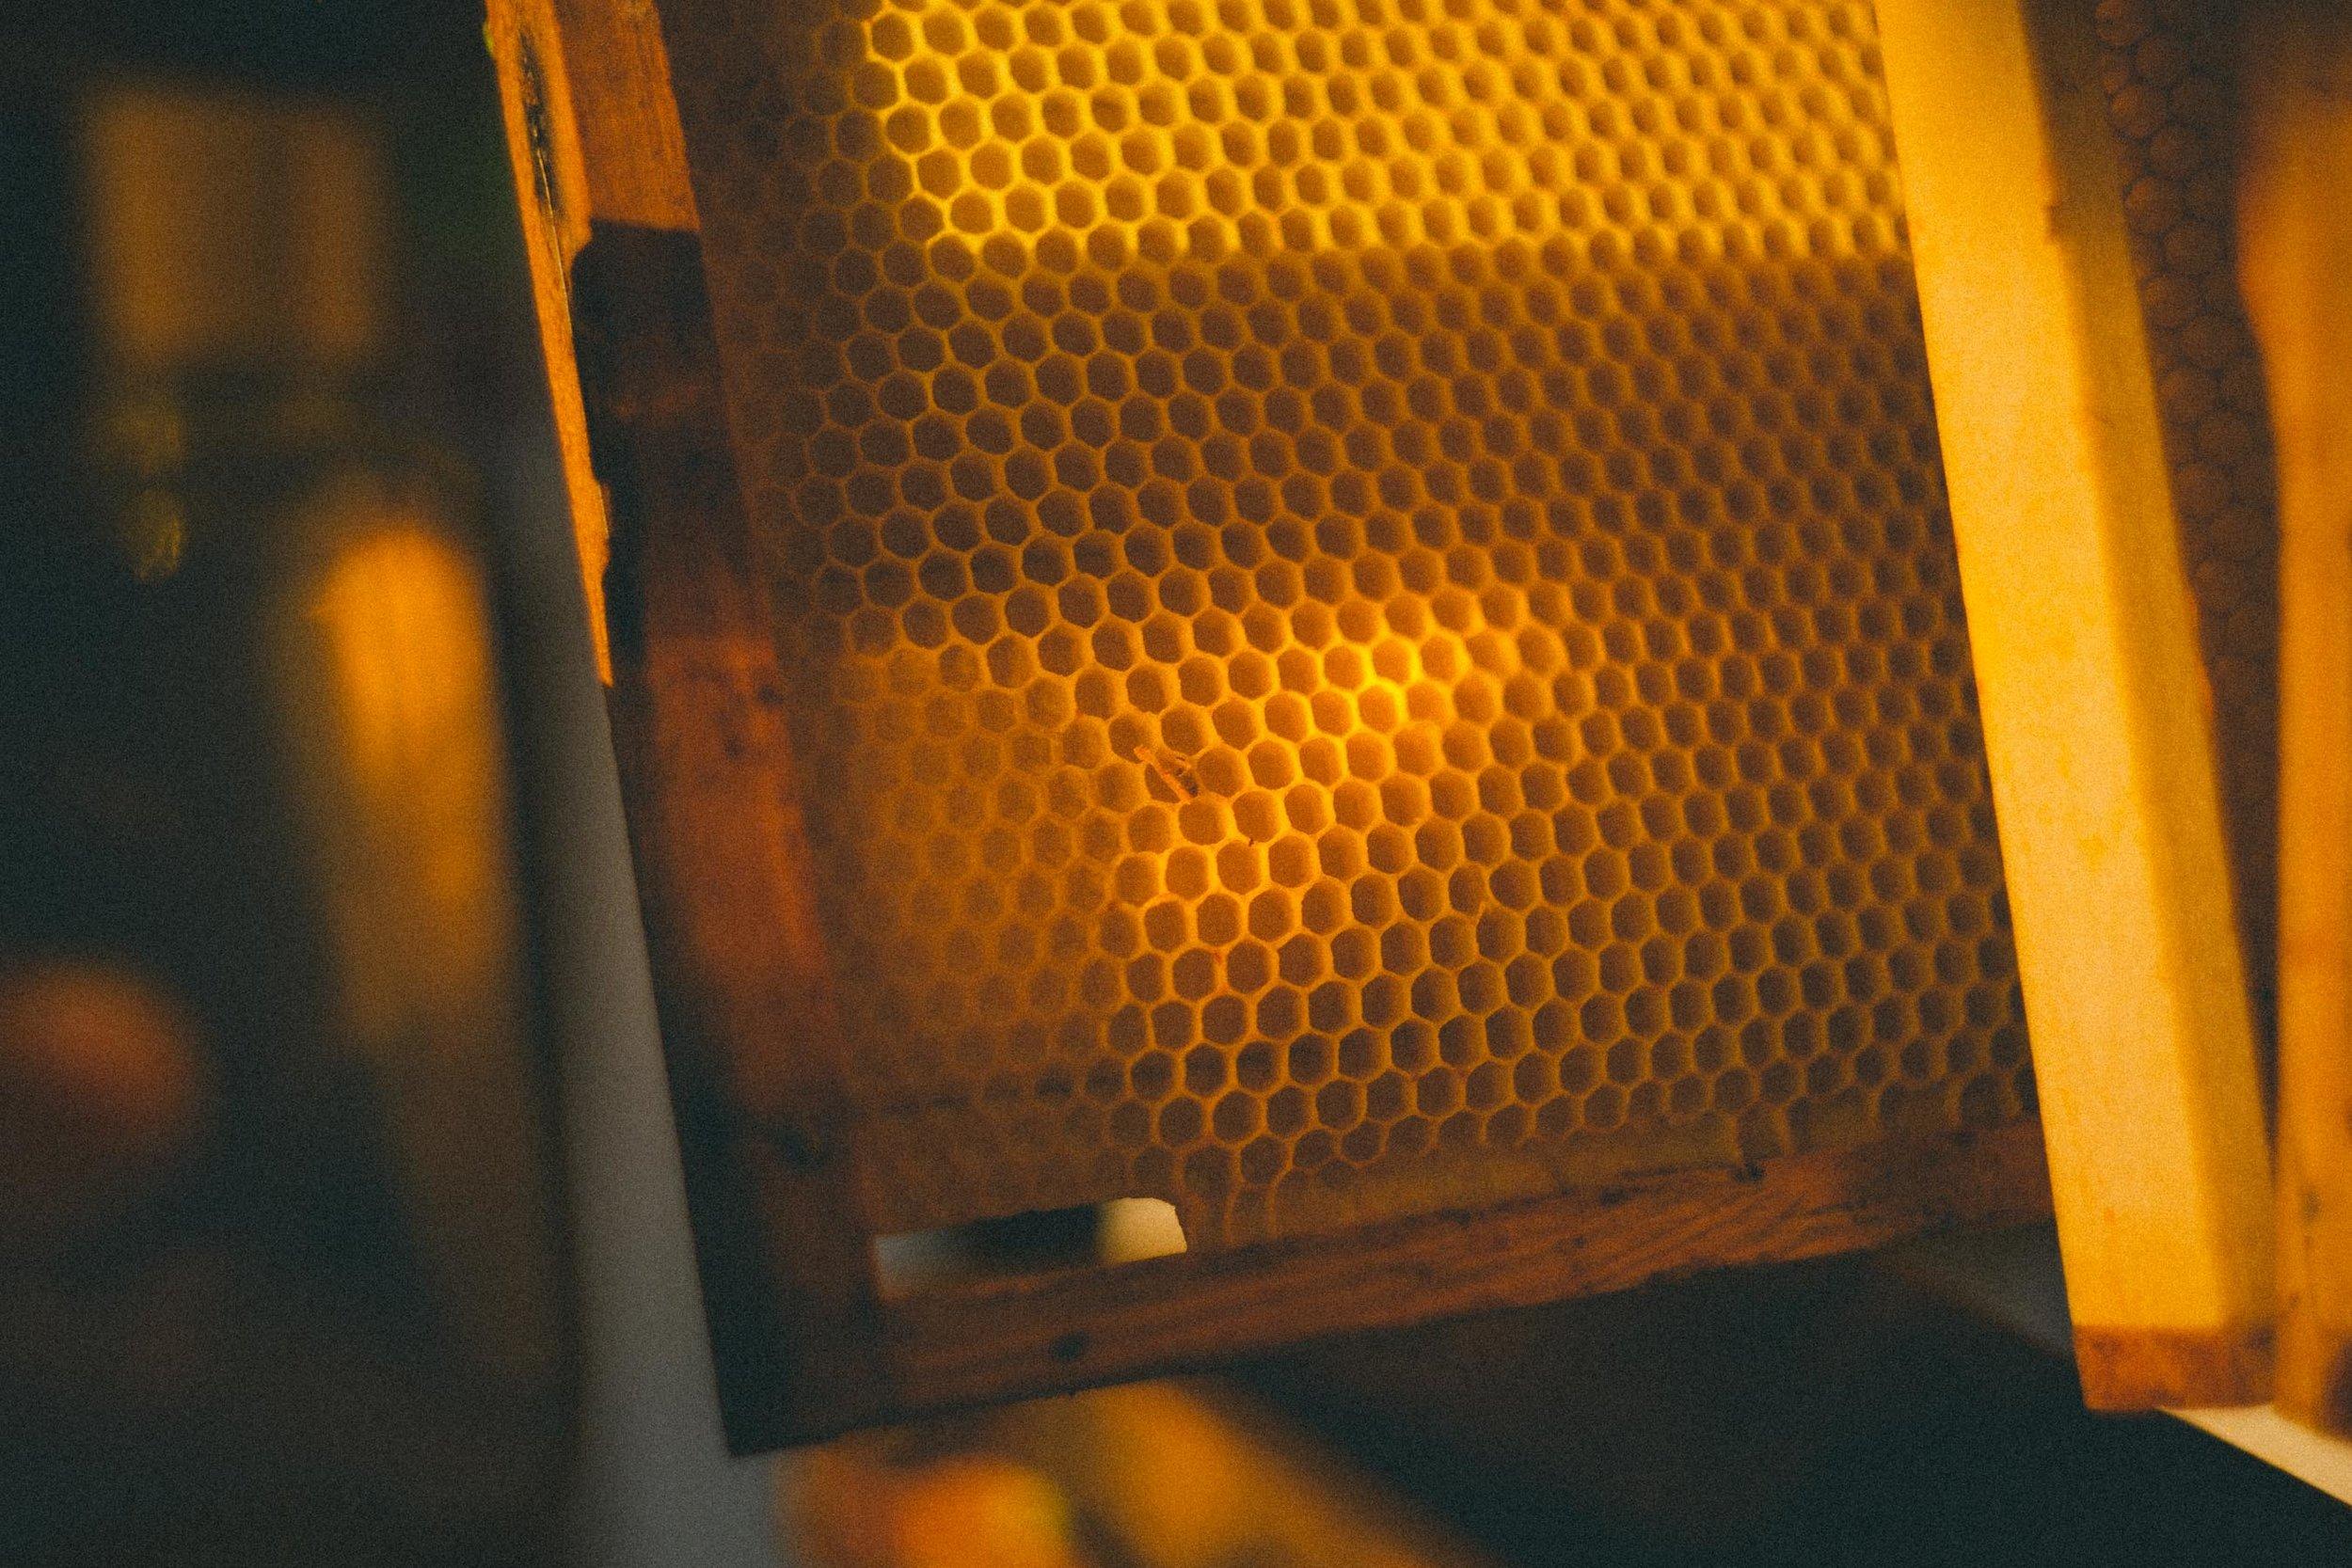 Karoline Greimel's Honey-21.jpg